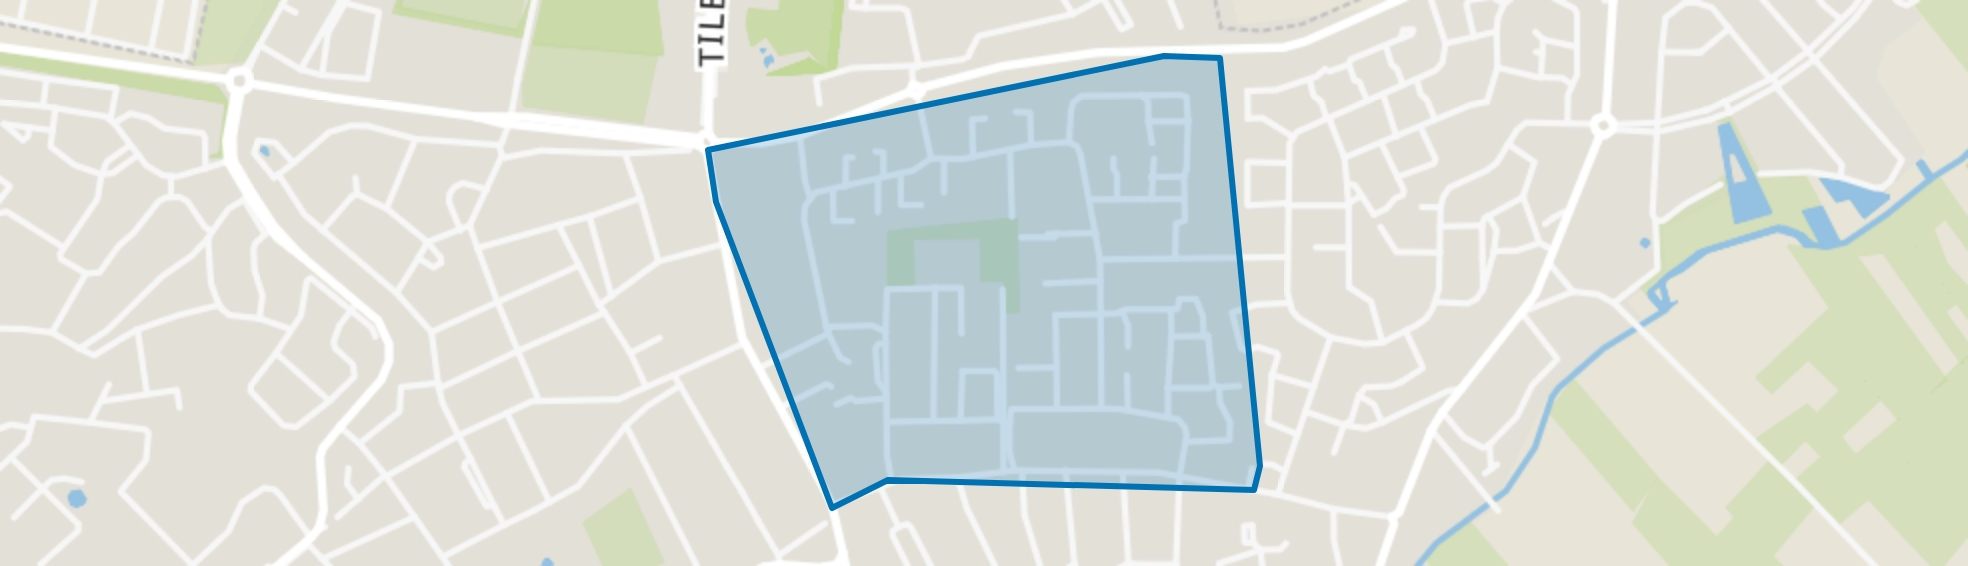 Grobbendonck, Goirle map